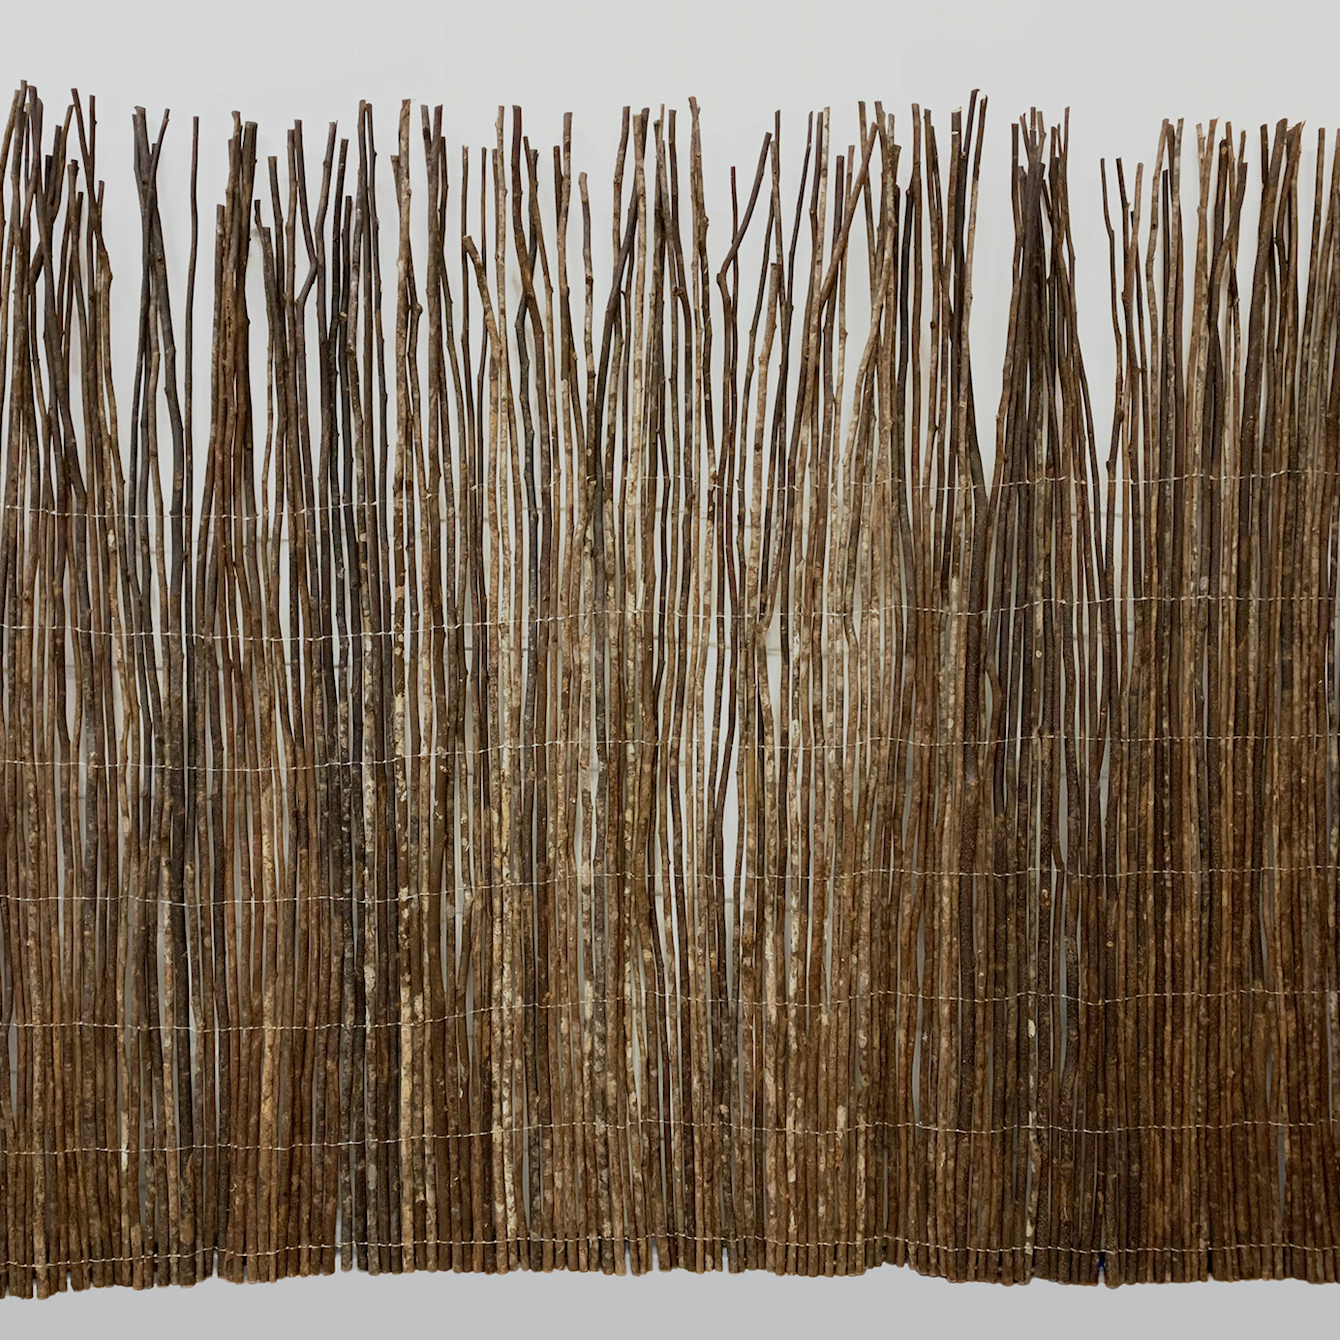 Boma Willow Bamboo Screen